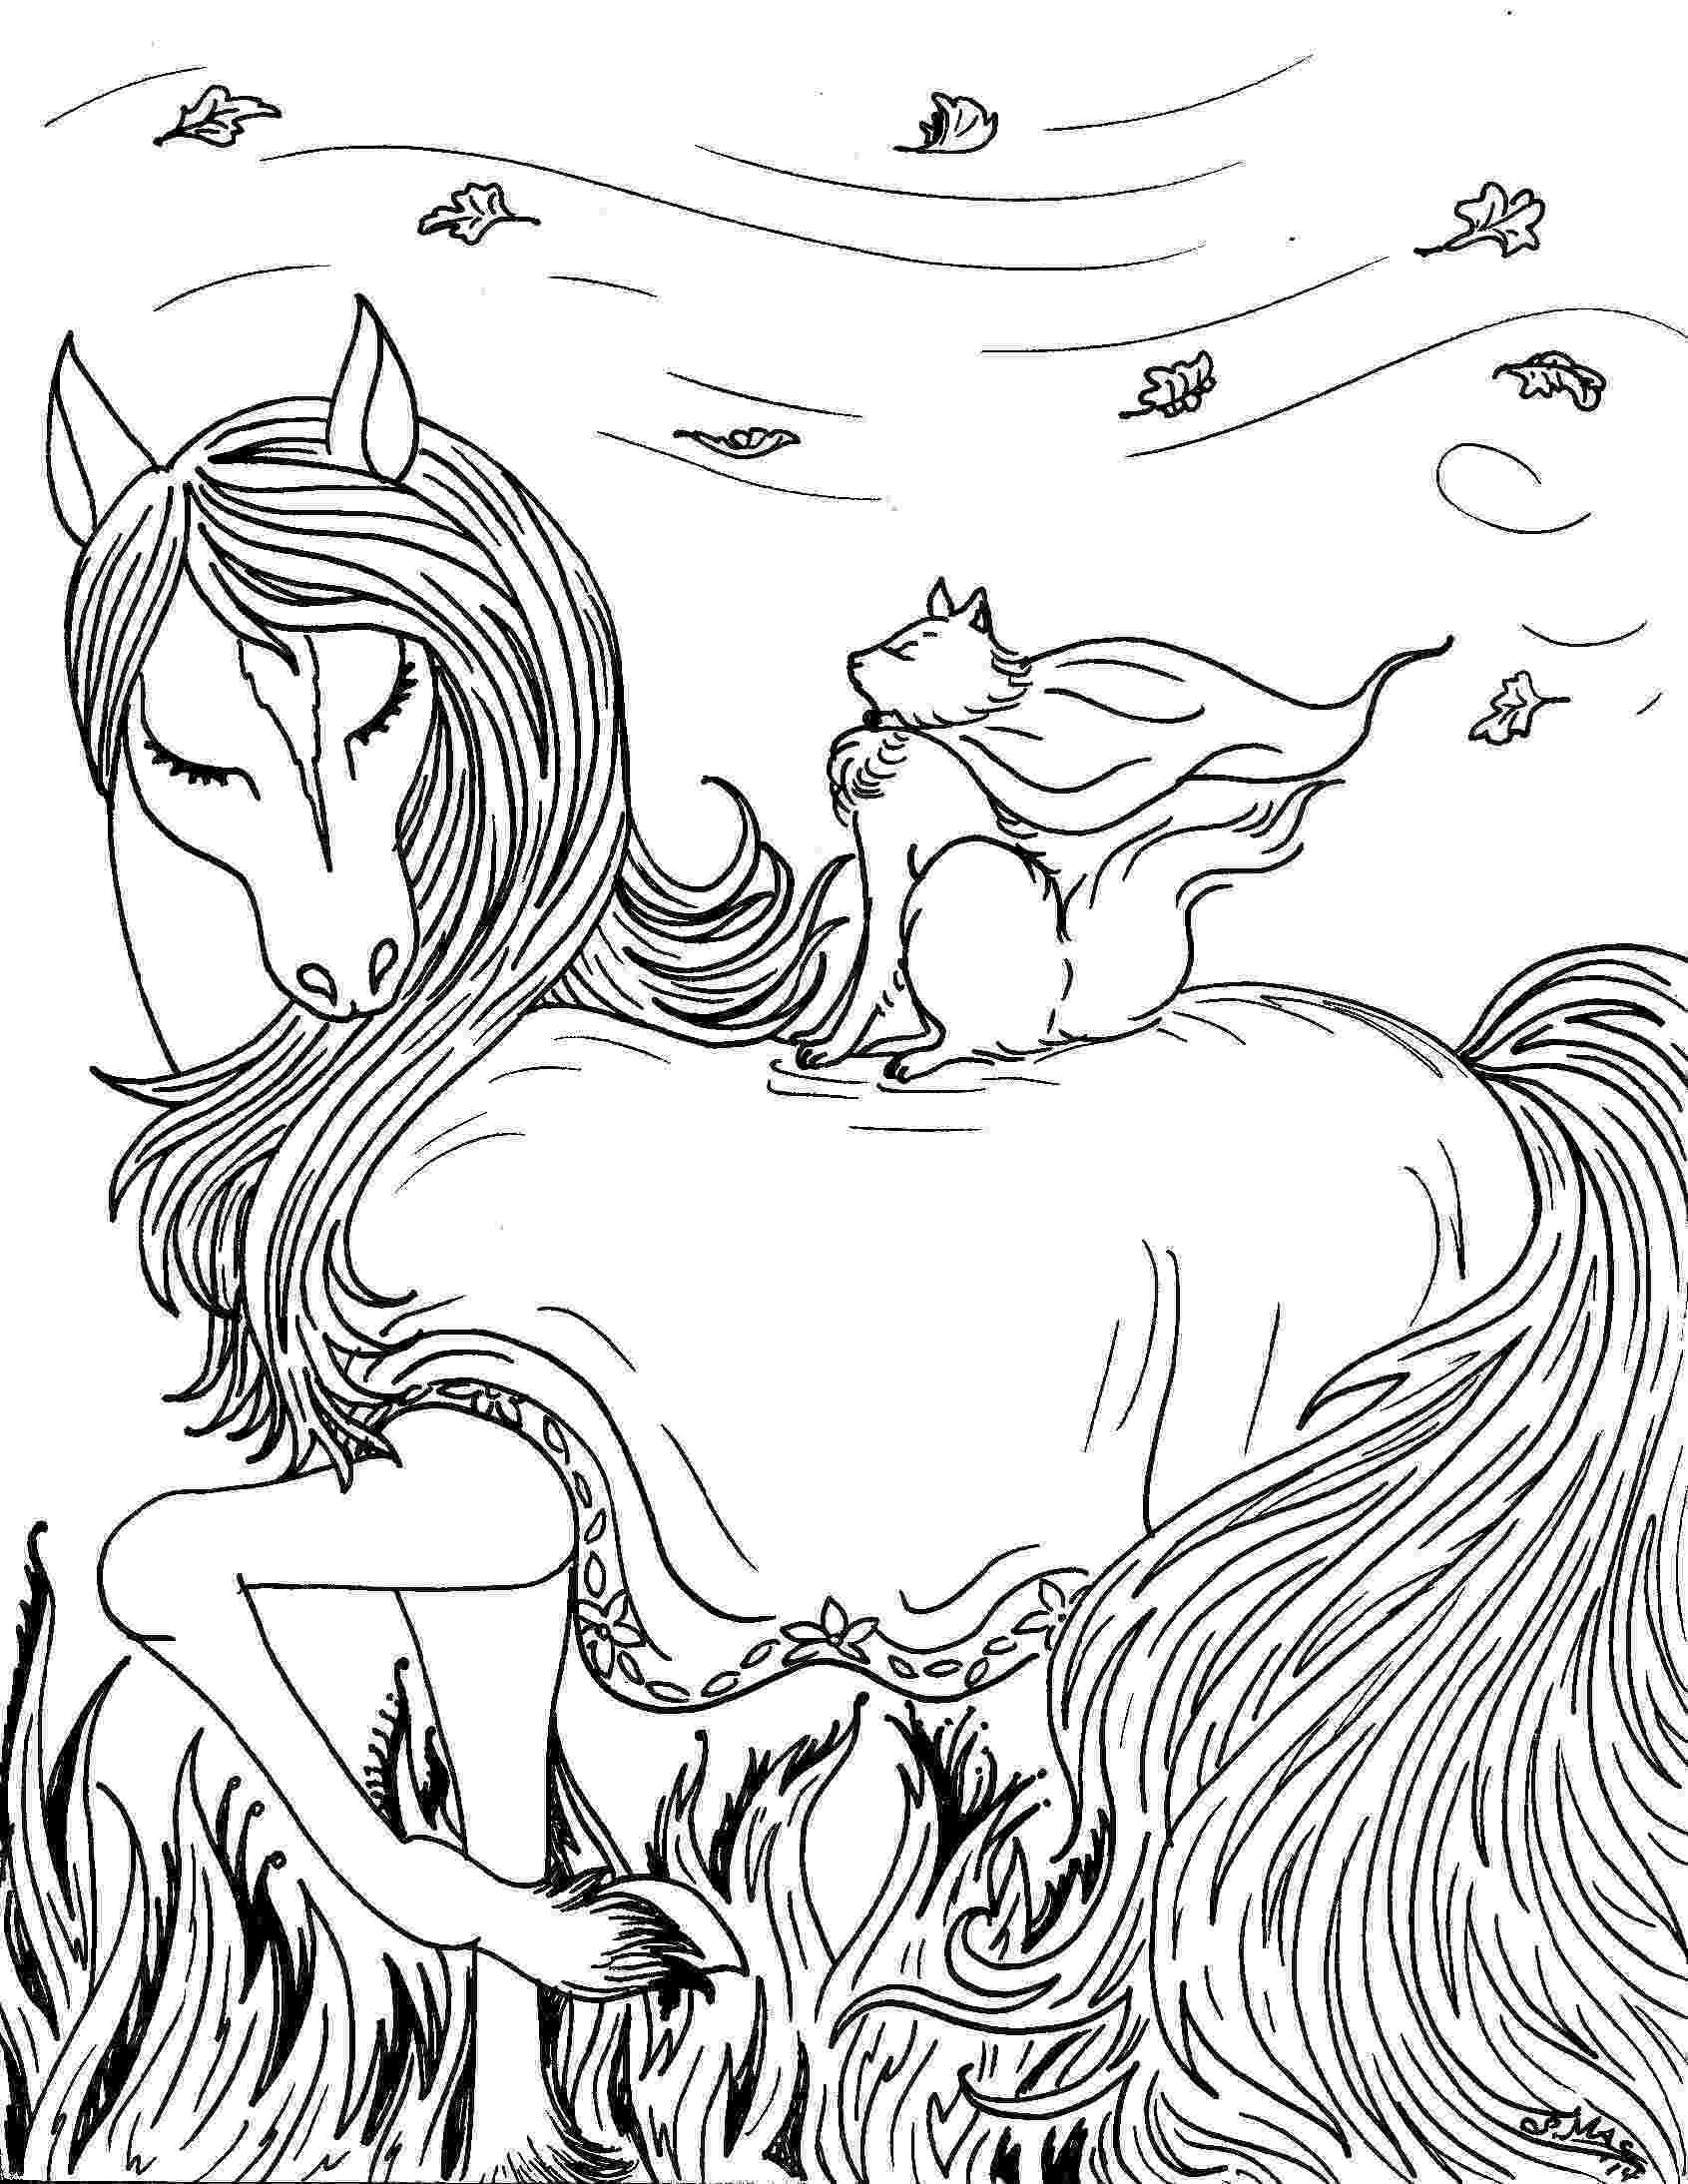 coloring pages fantasy free printable fantasy coloring pages for kids best fantasy pages coloring